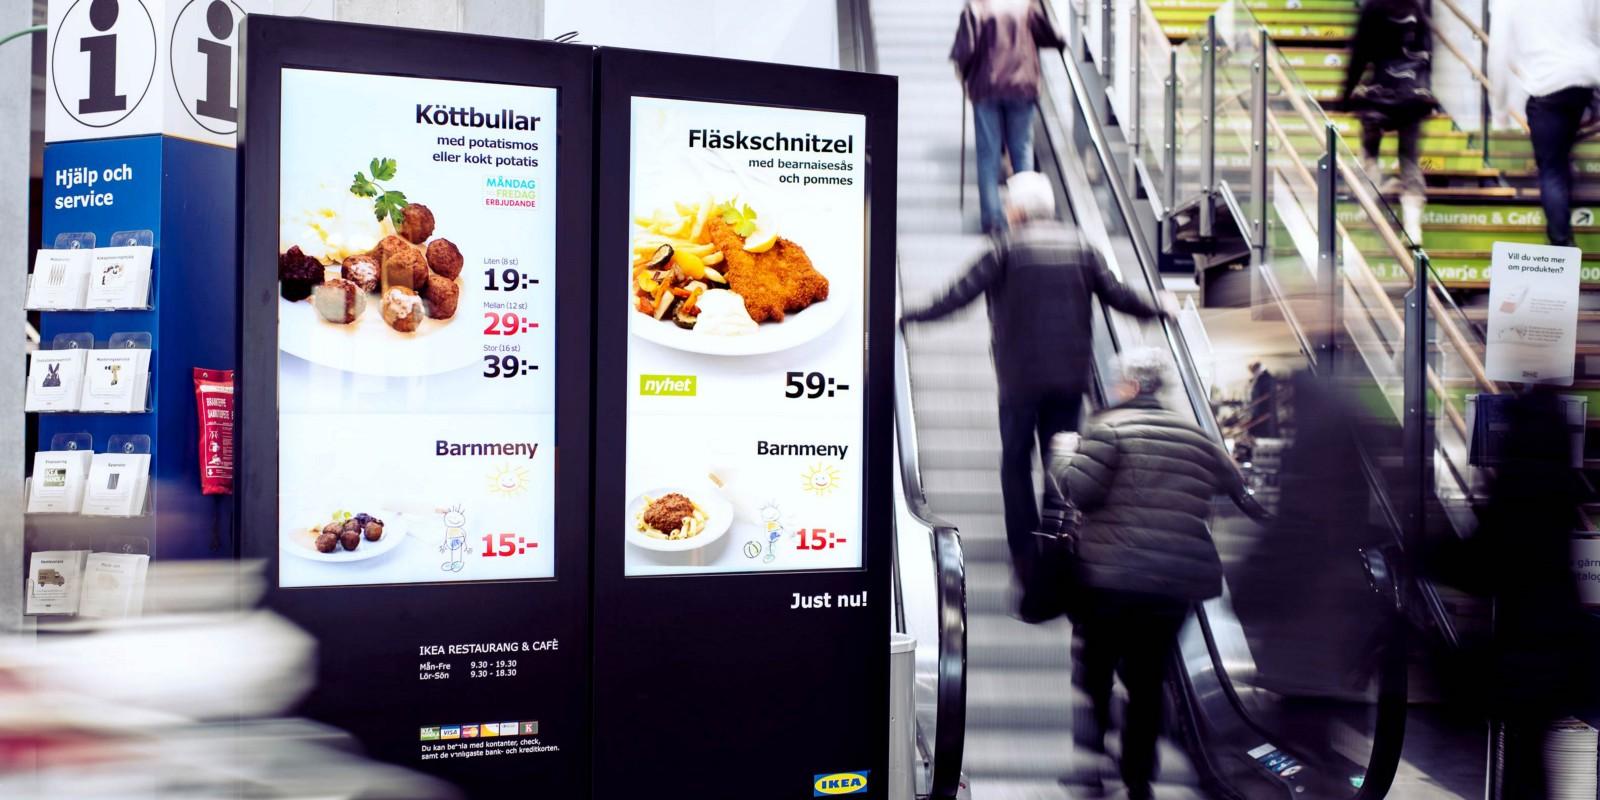 schermi led pubblicitari